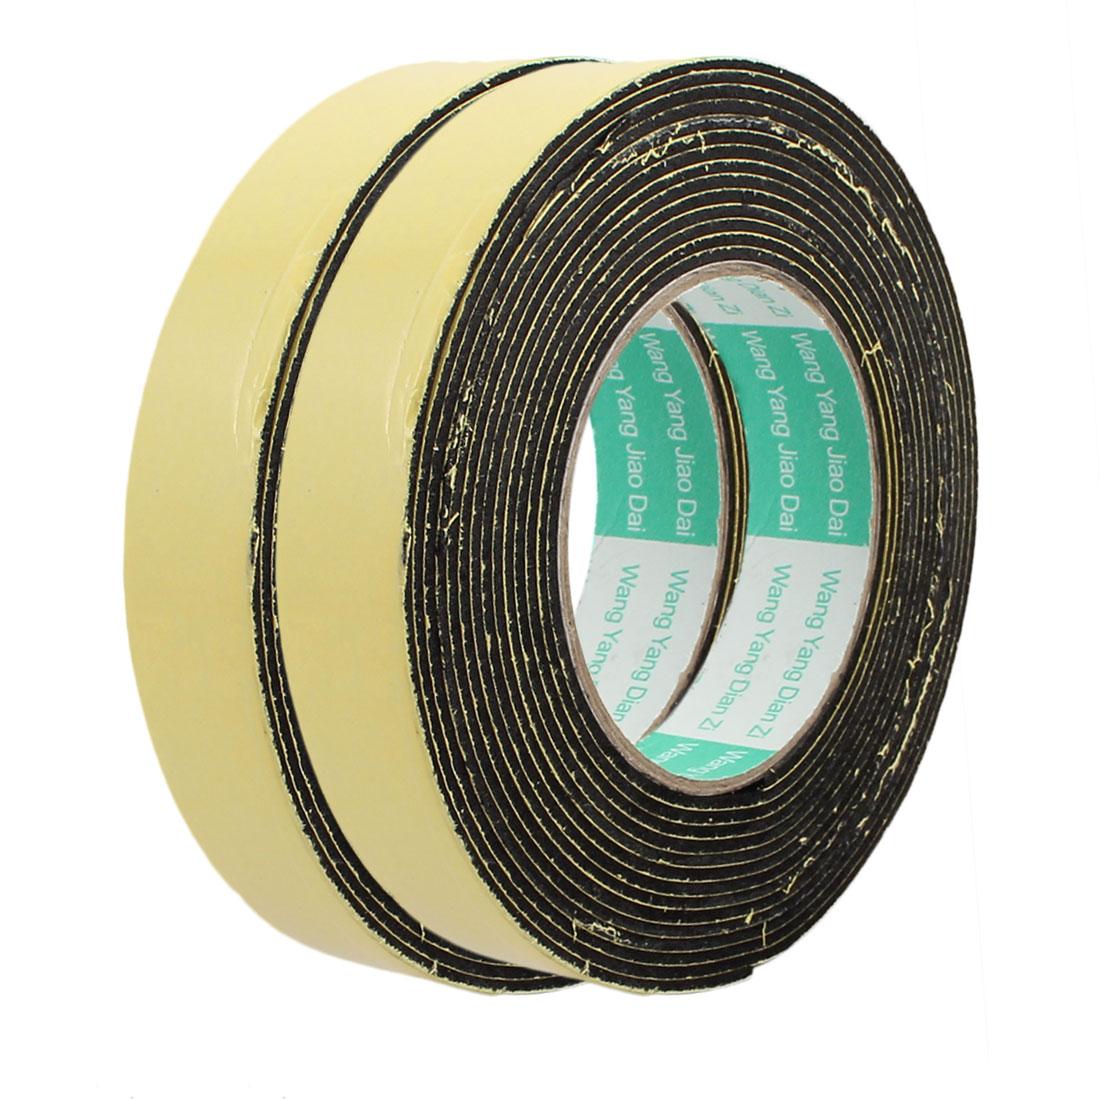 2pcs 5M 25mm x 2mm Single-side Adhesive Shockproof Sponge Foam Tape Yellow Black